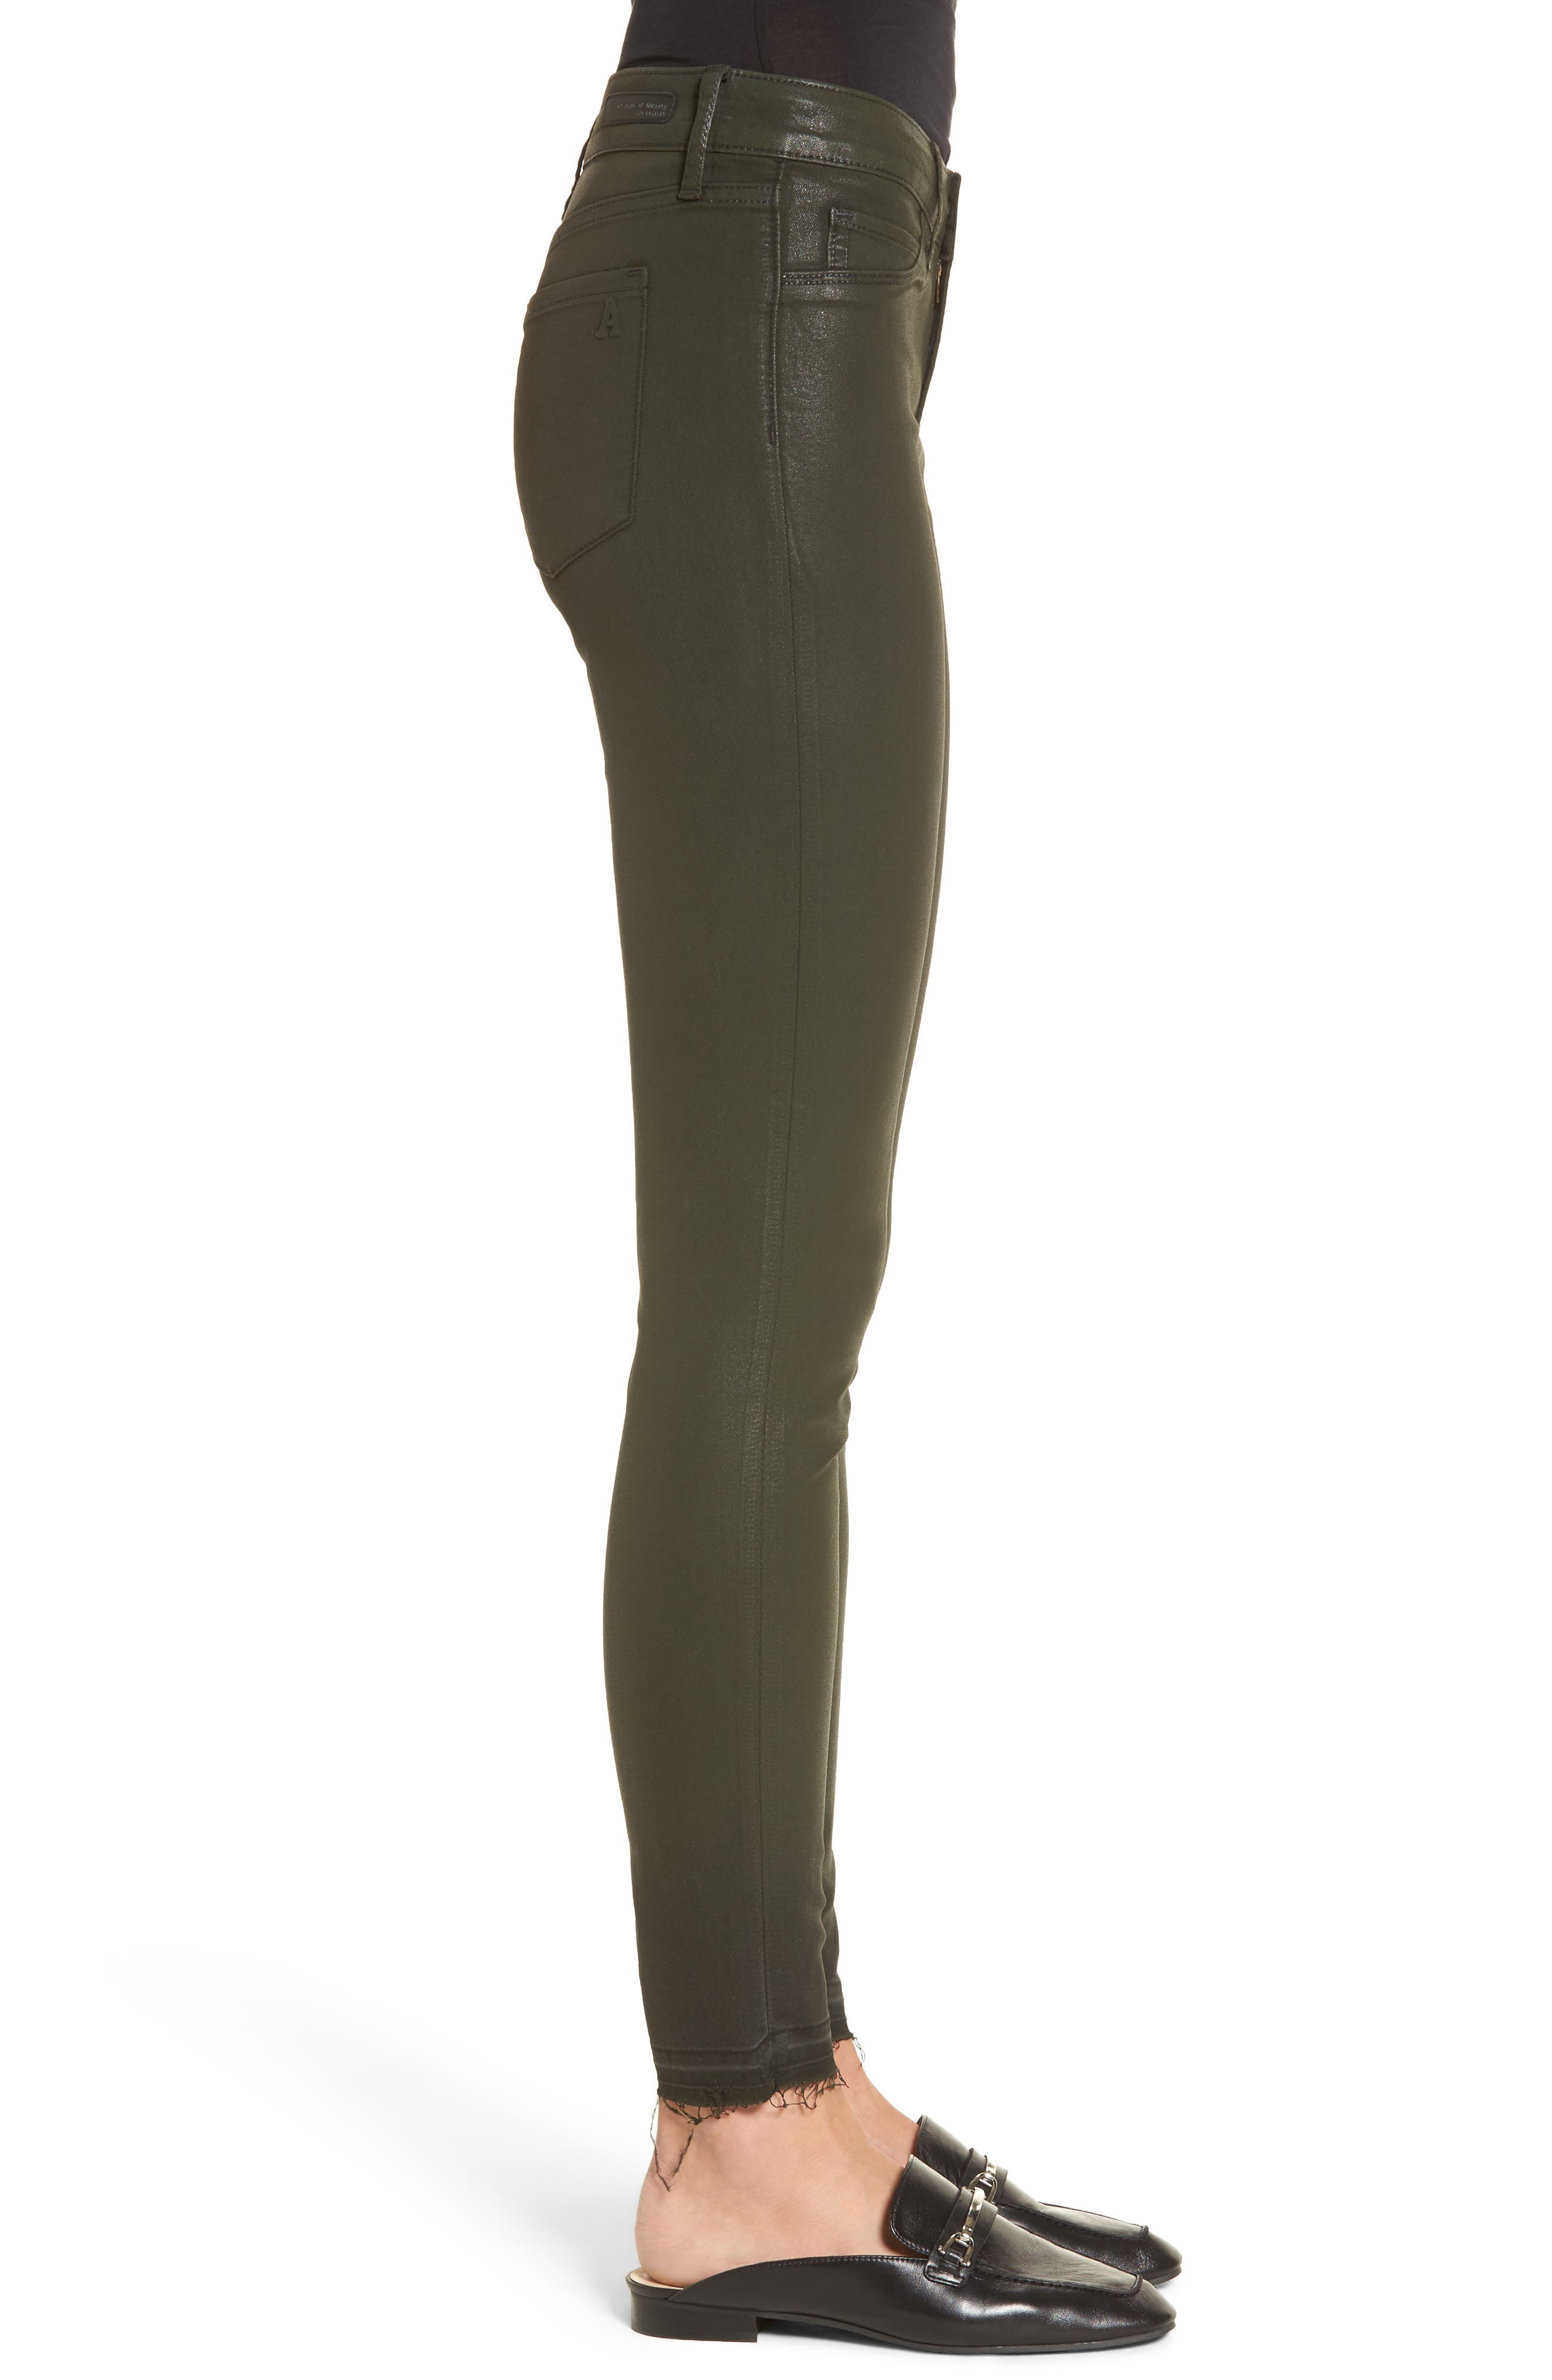 Sarah Coated Skinny Jeans,                             Alternate thumbnail 3, color,                             317